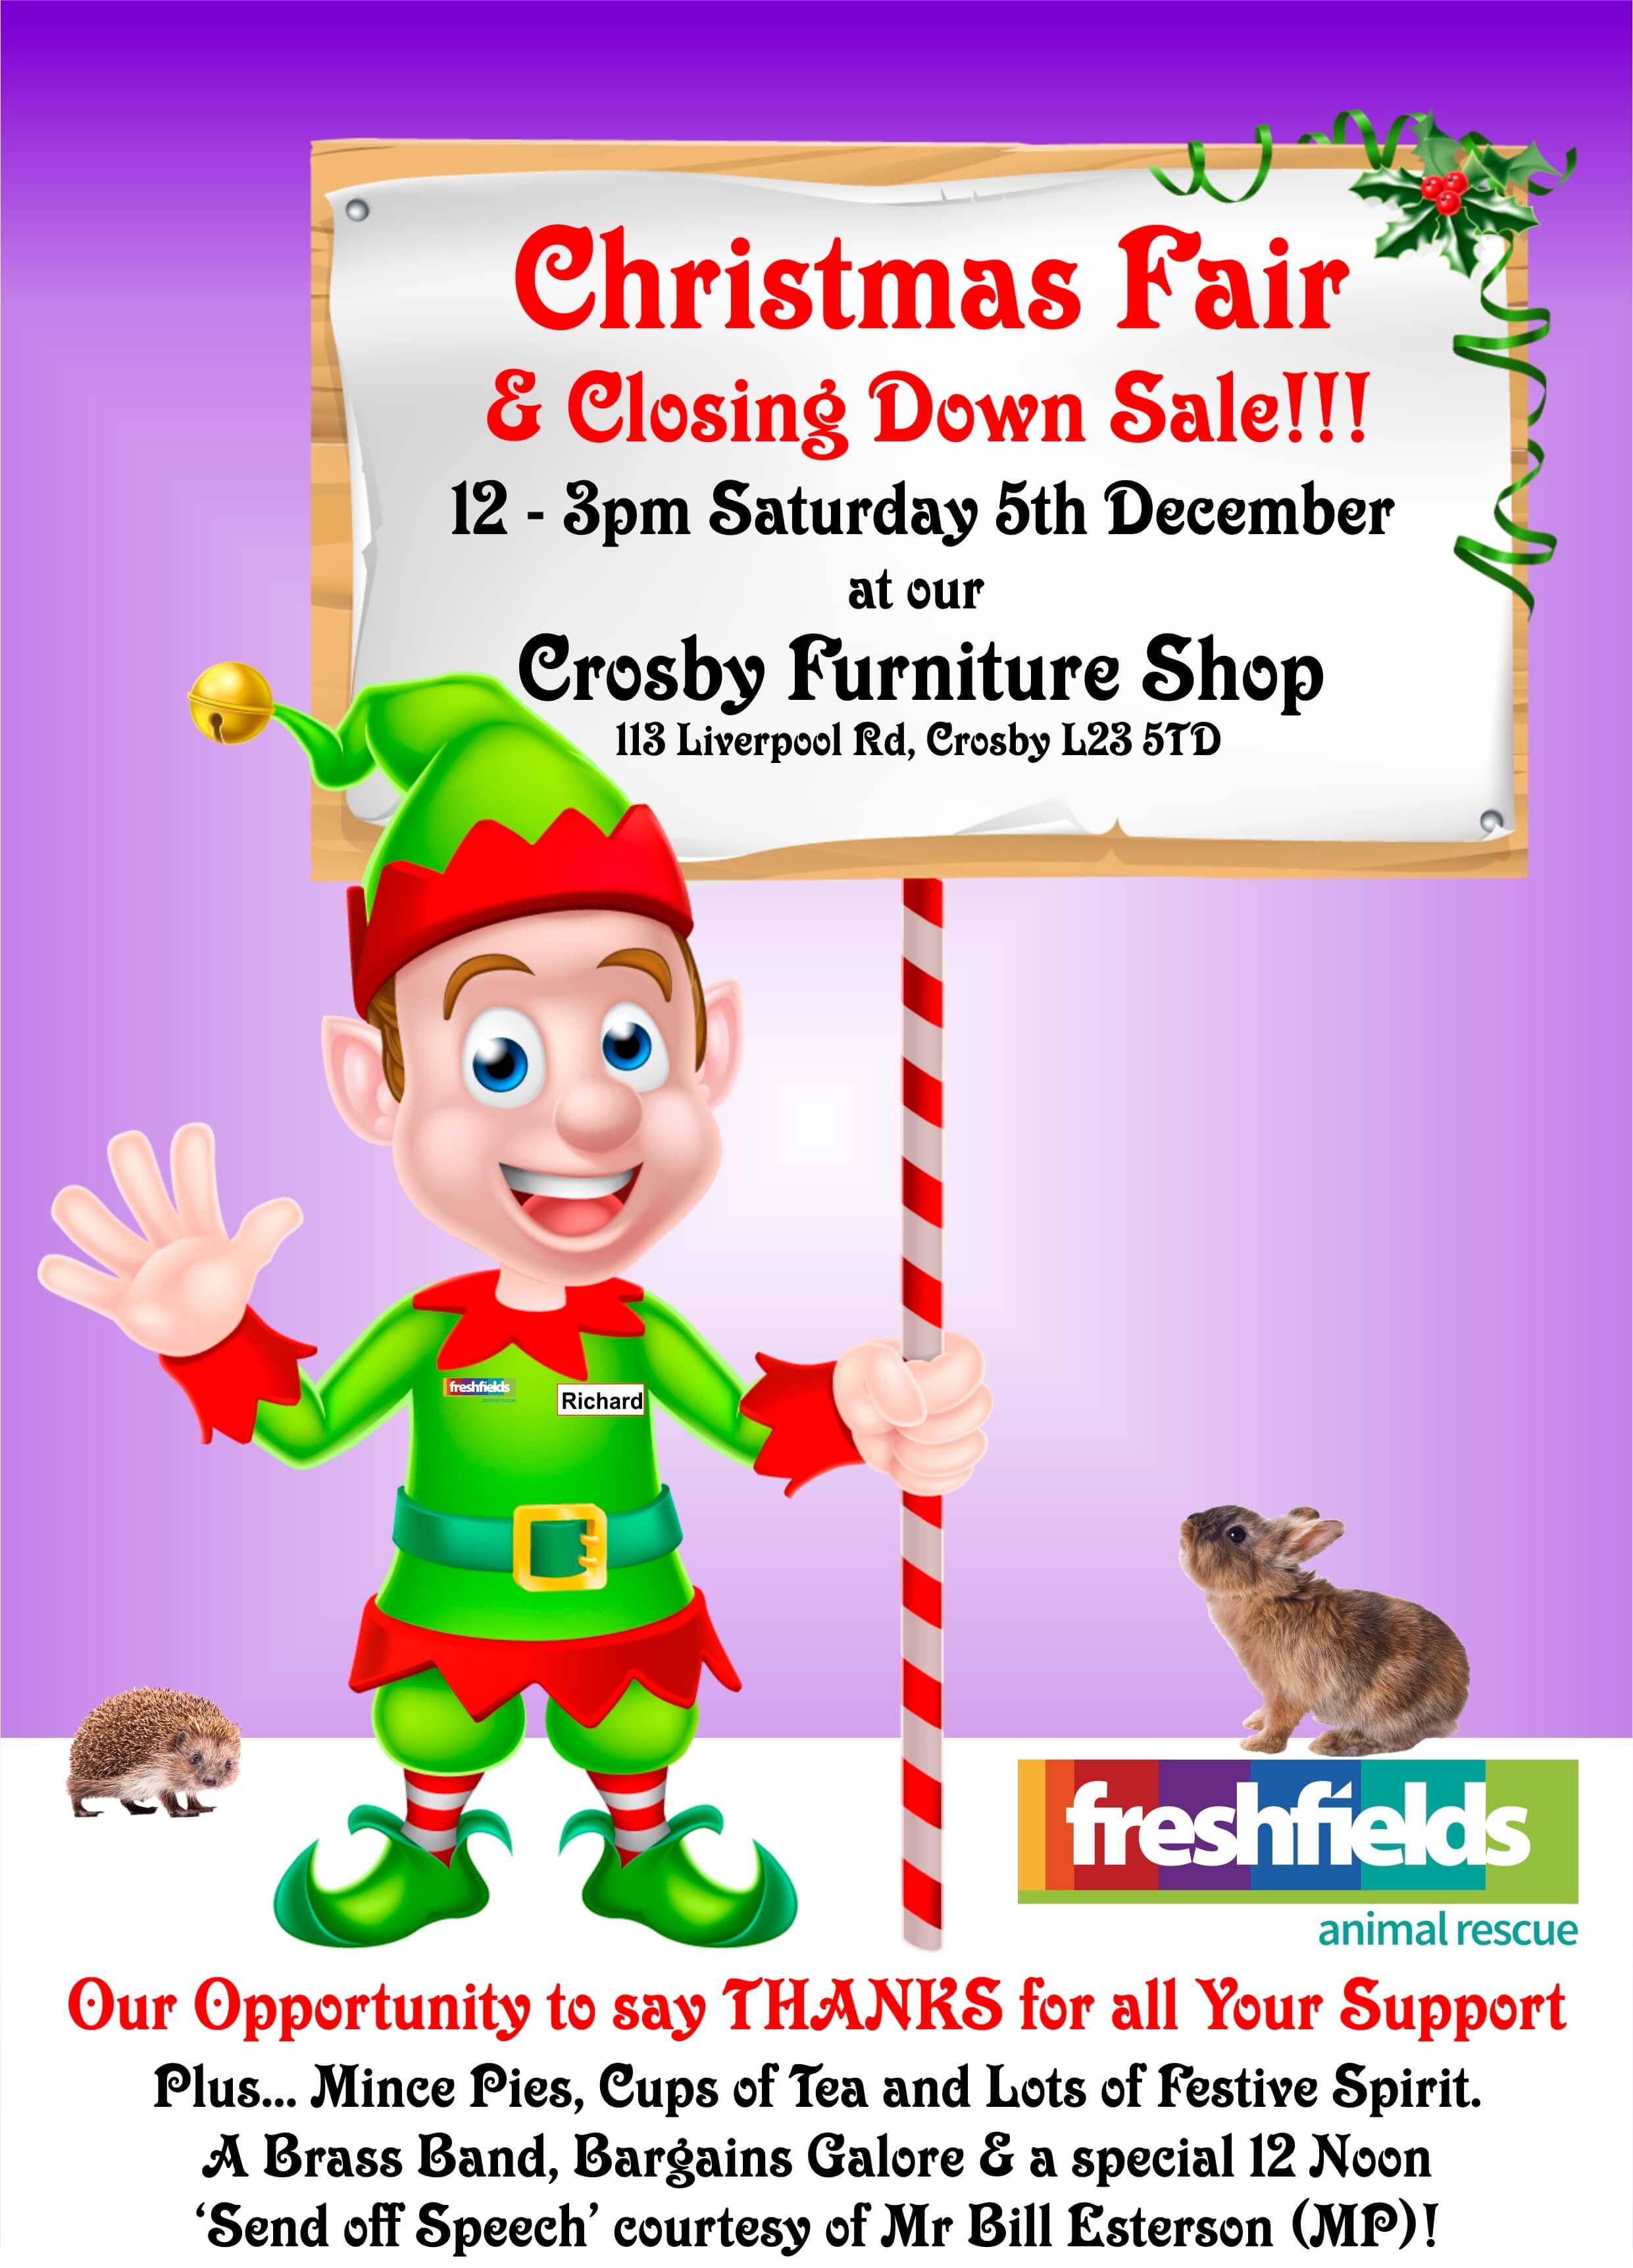 Crosby_Christmas_fair_posterWEBREADY.jpg